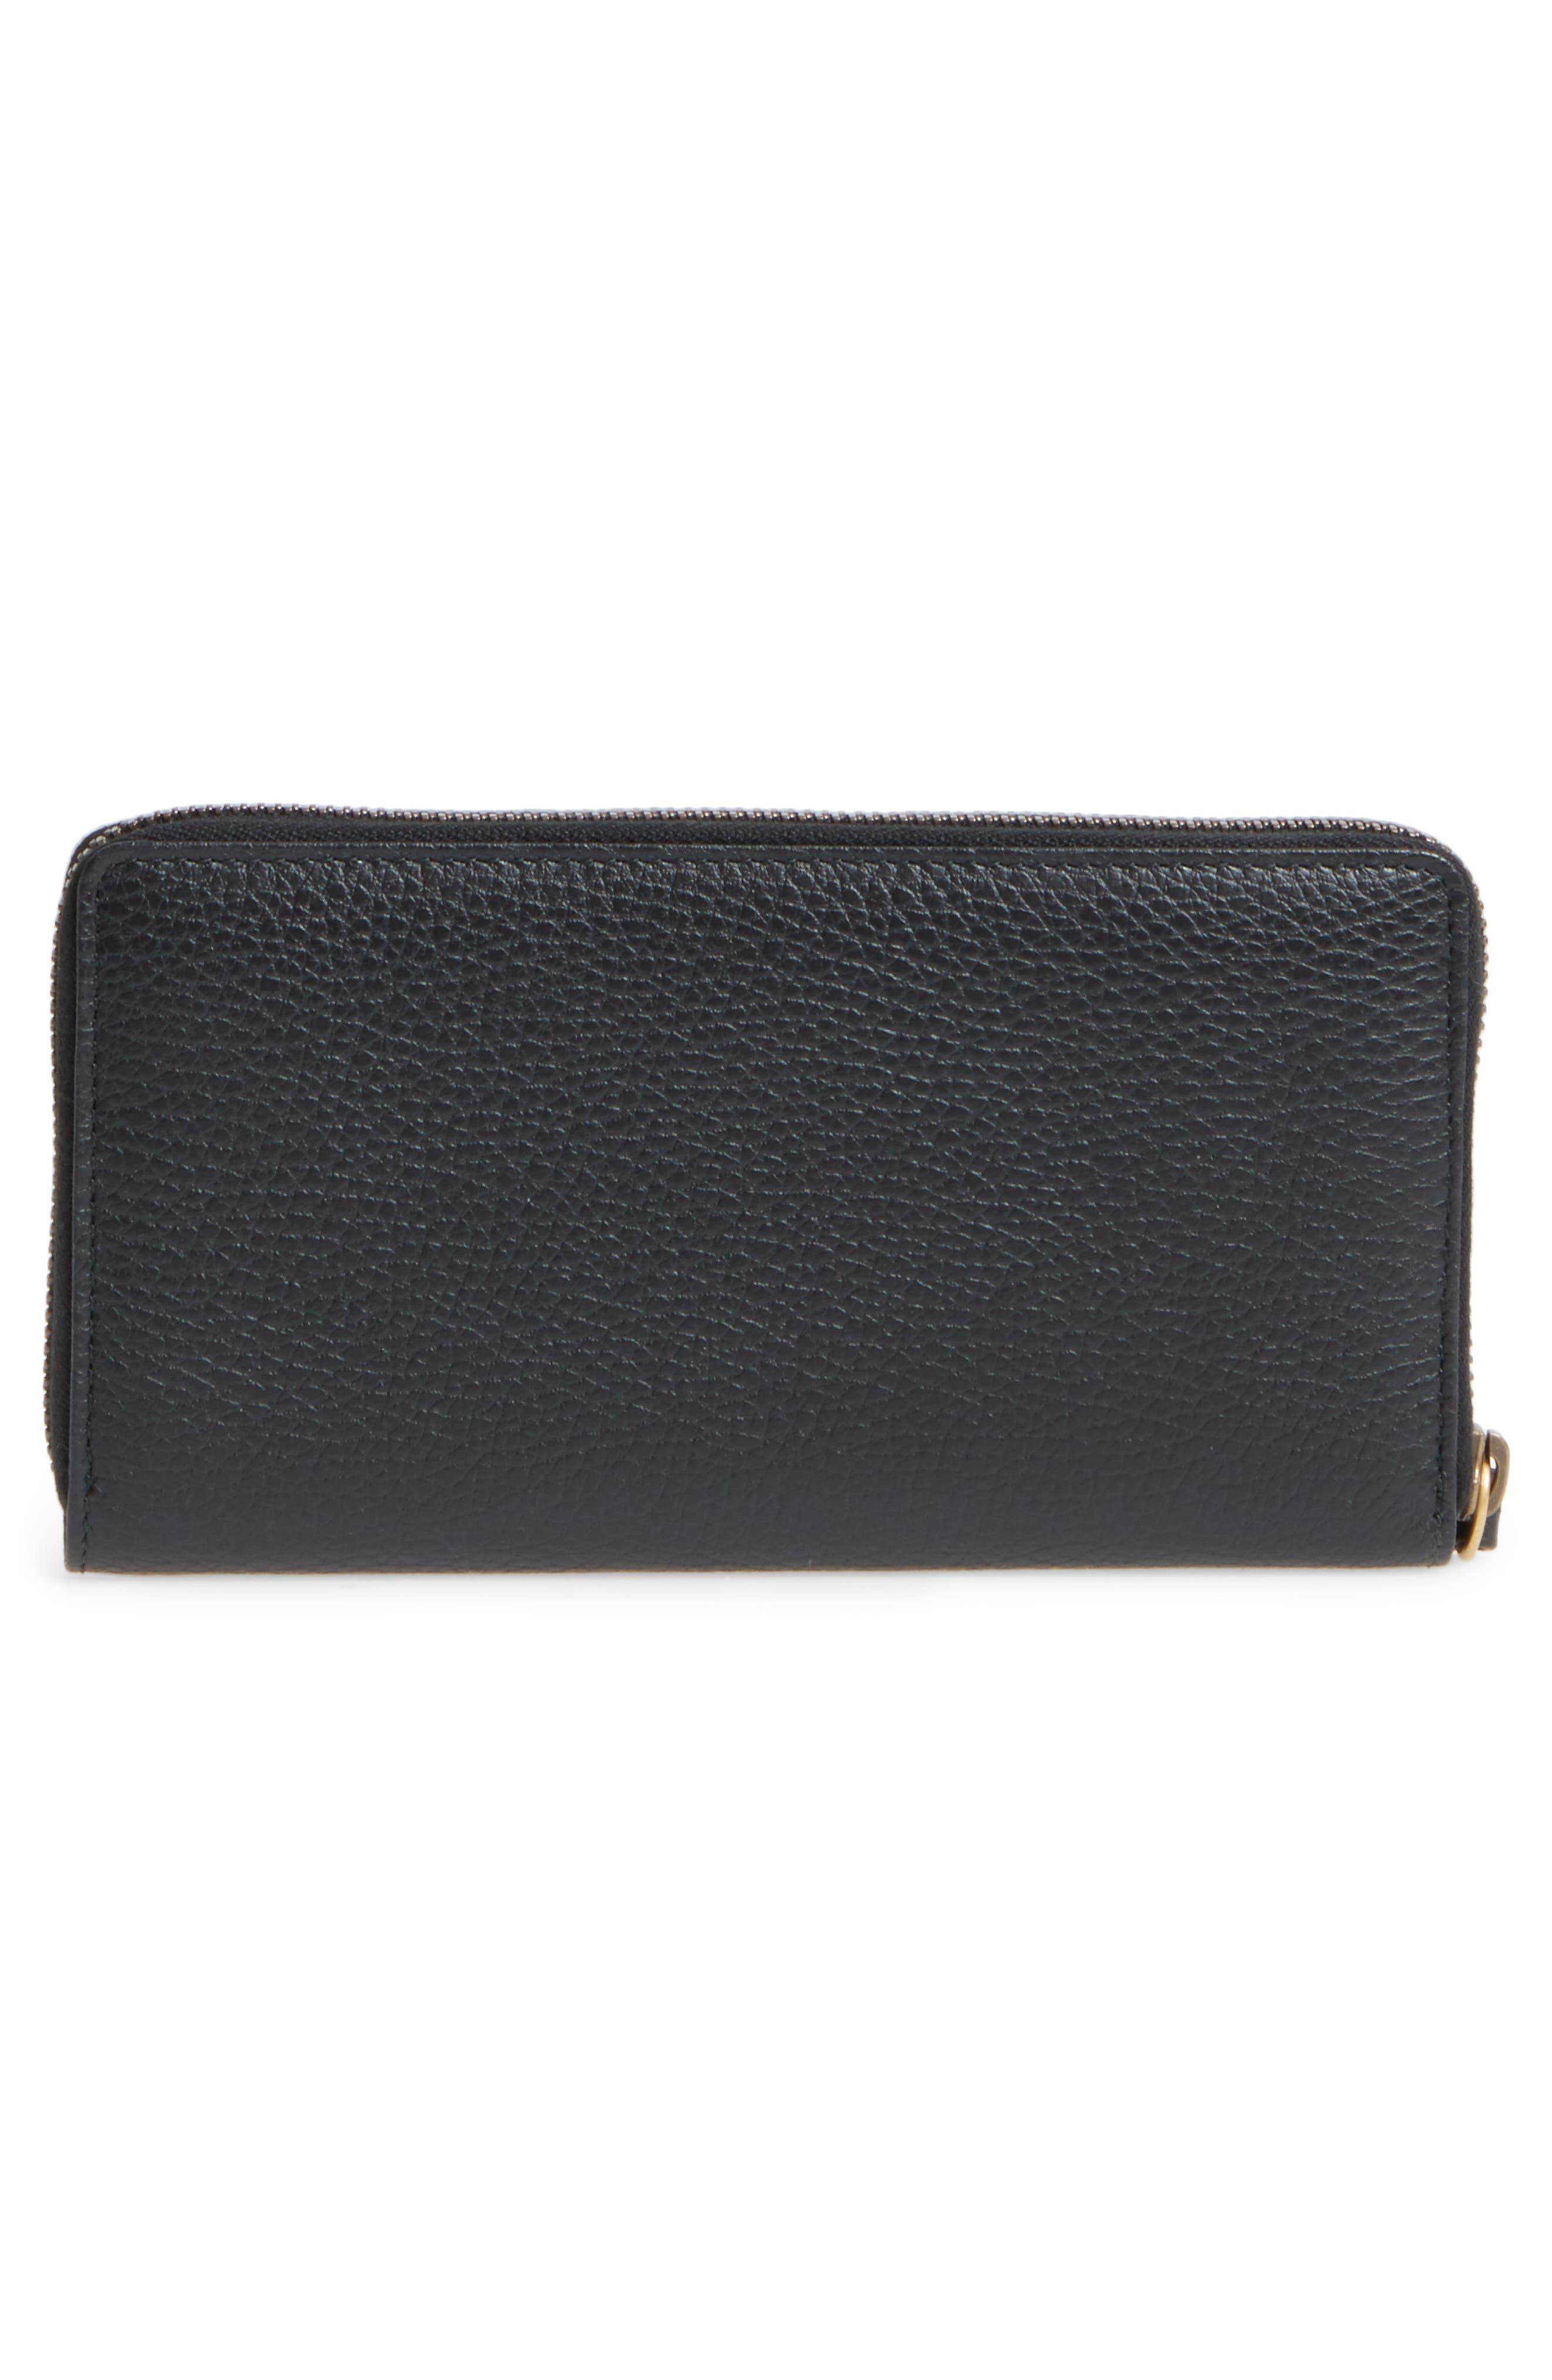 Farfalla Zip Around Leather Wallet,                             Alternate thumbnail 3, color,                             NERO/ CRYSTAL